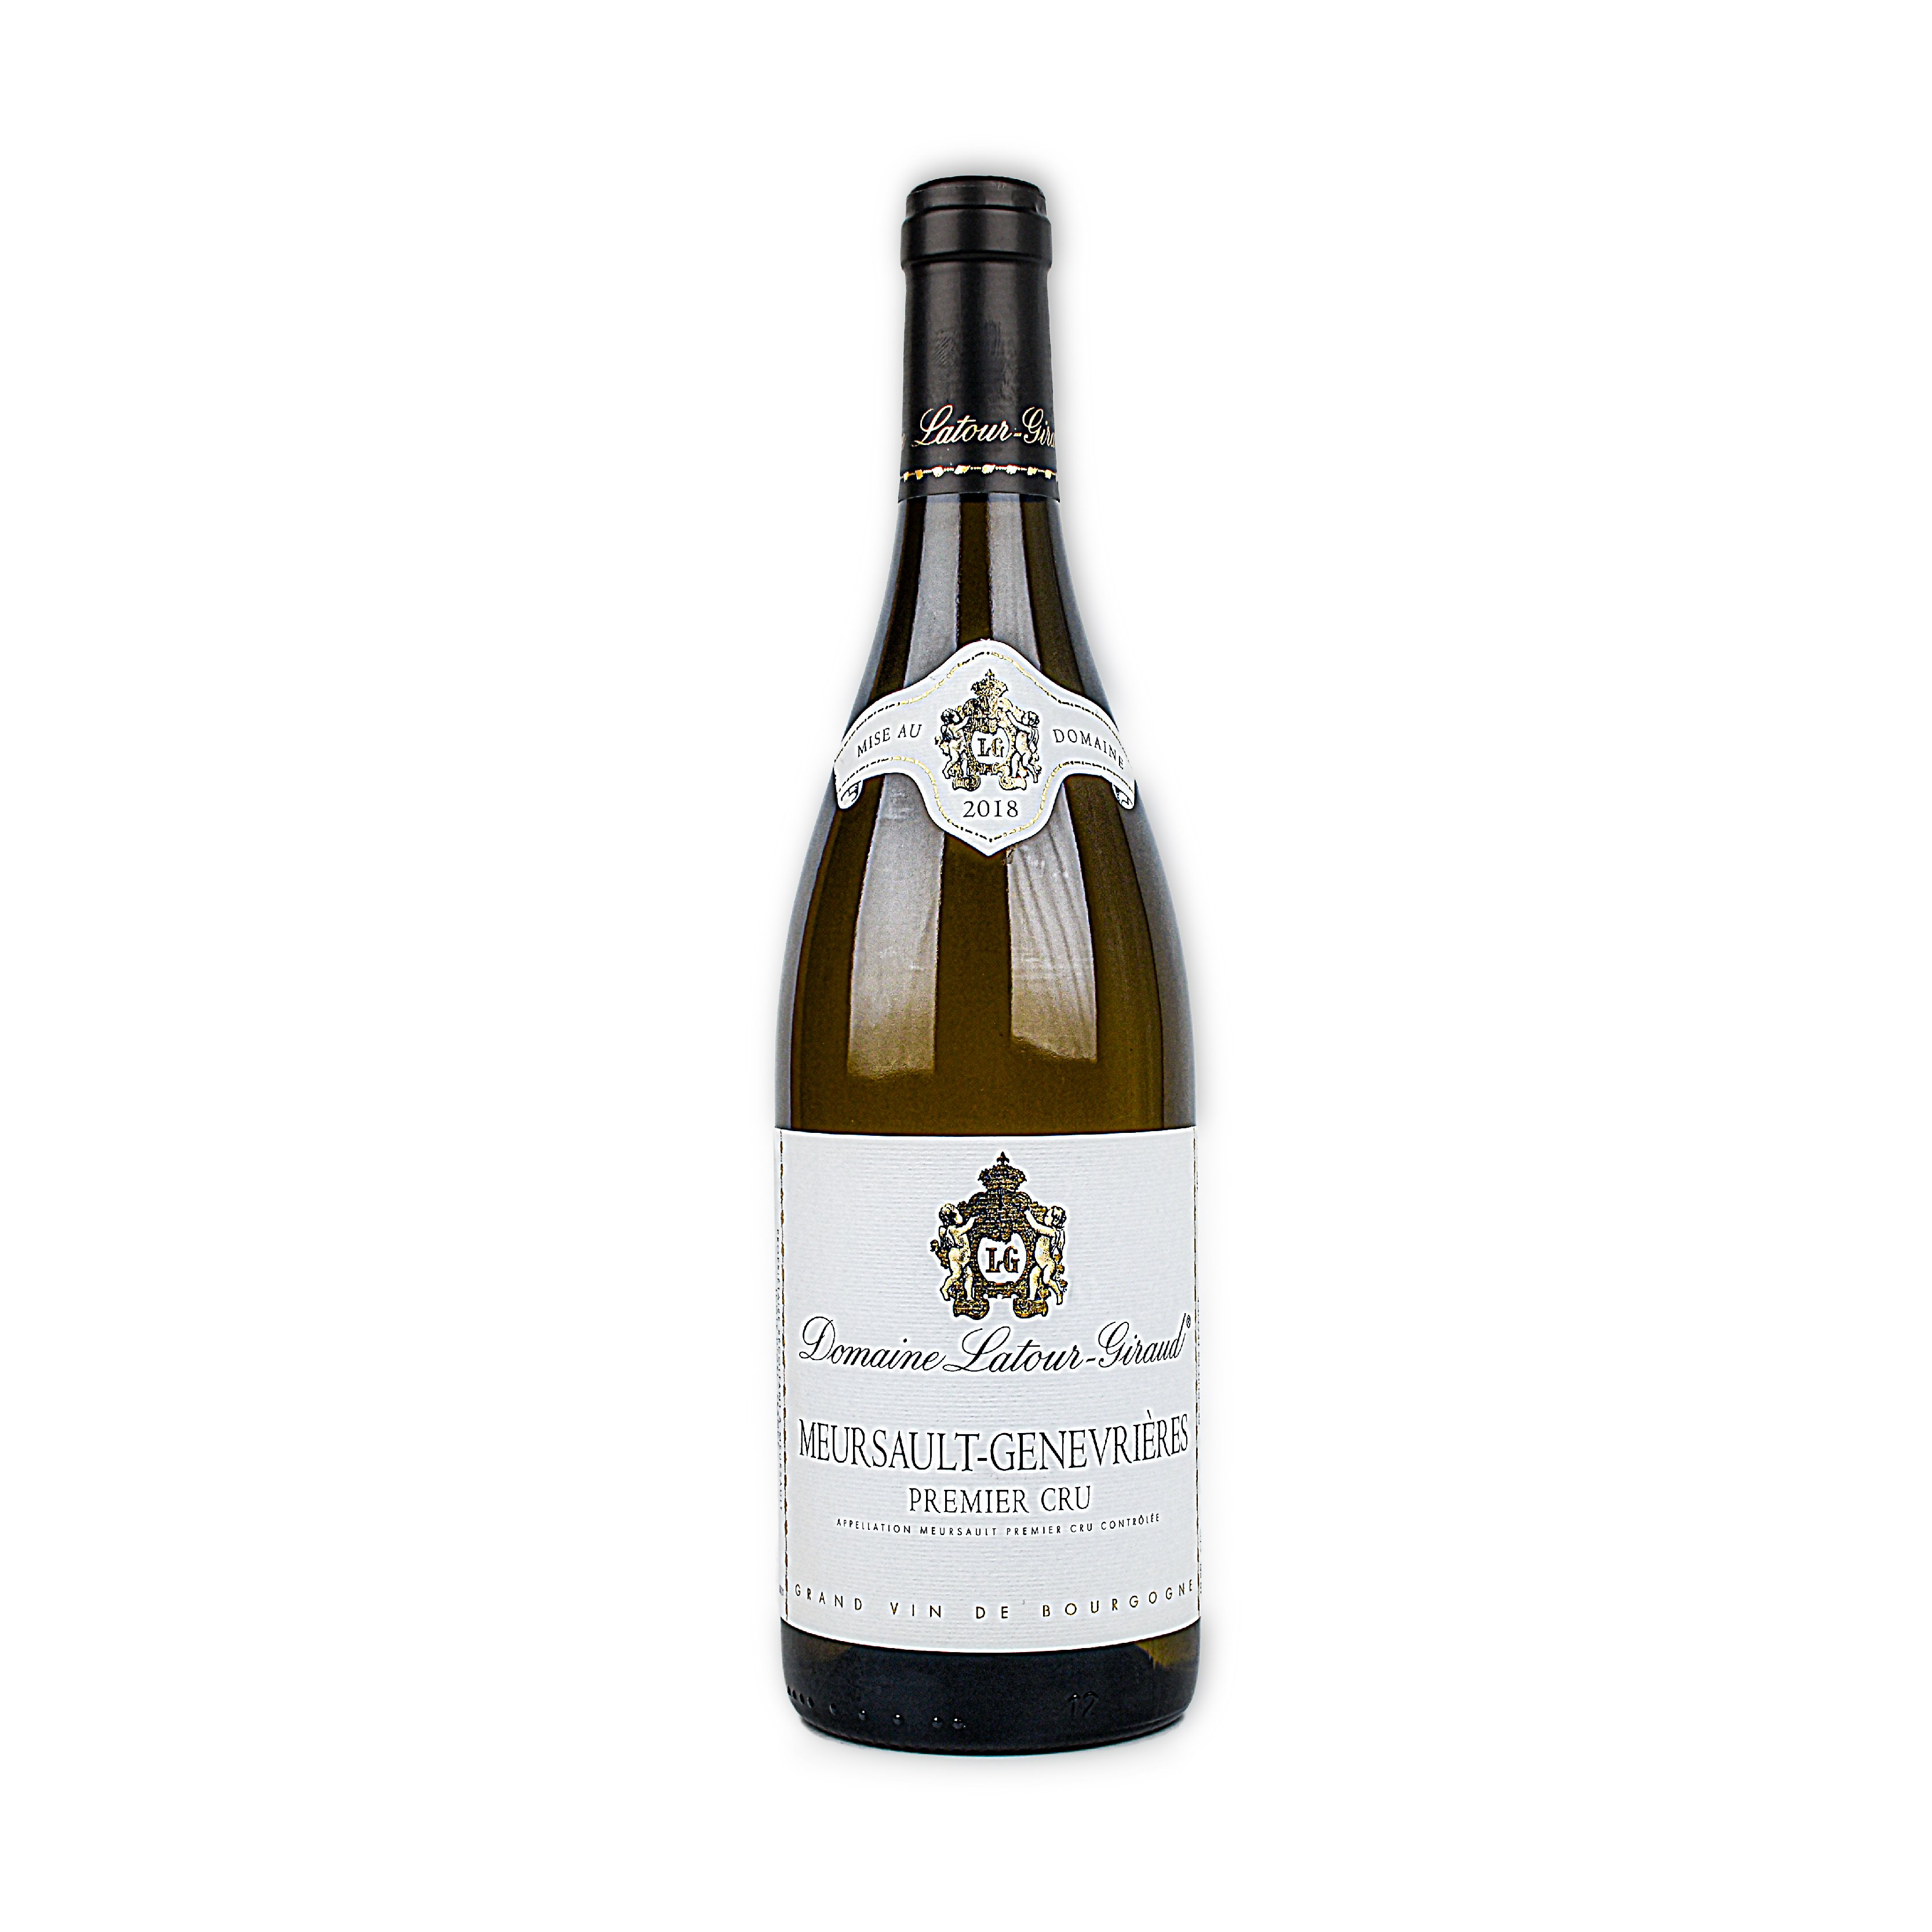 JL Vergnon Conversation Brut Blanc de Blancs Grand Cru, NV, 75CL